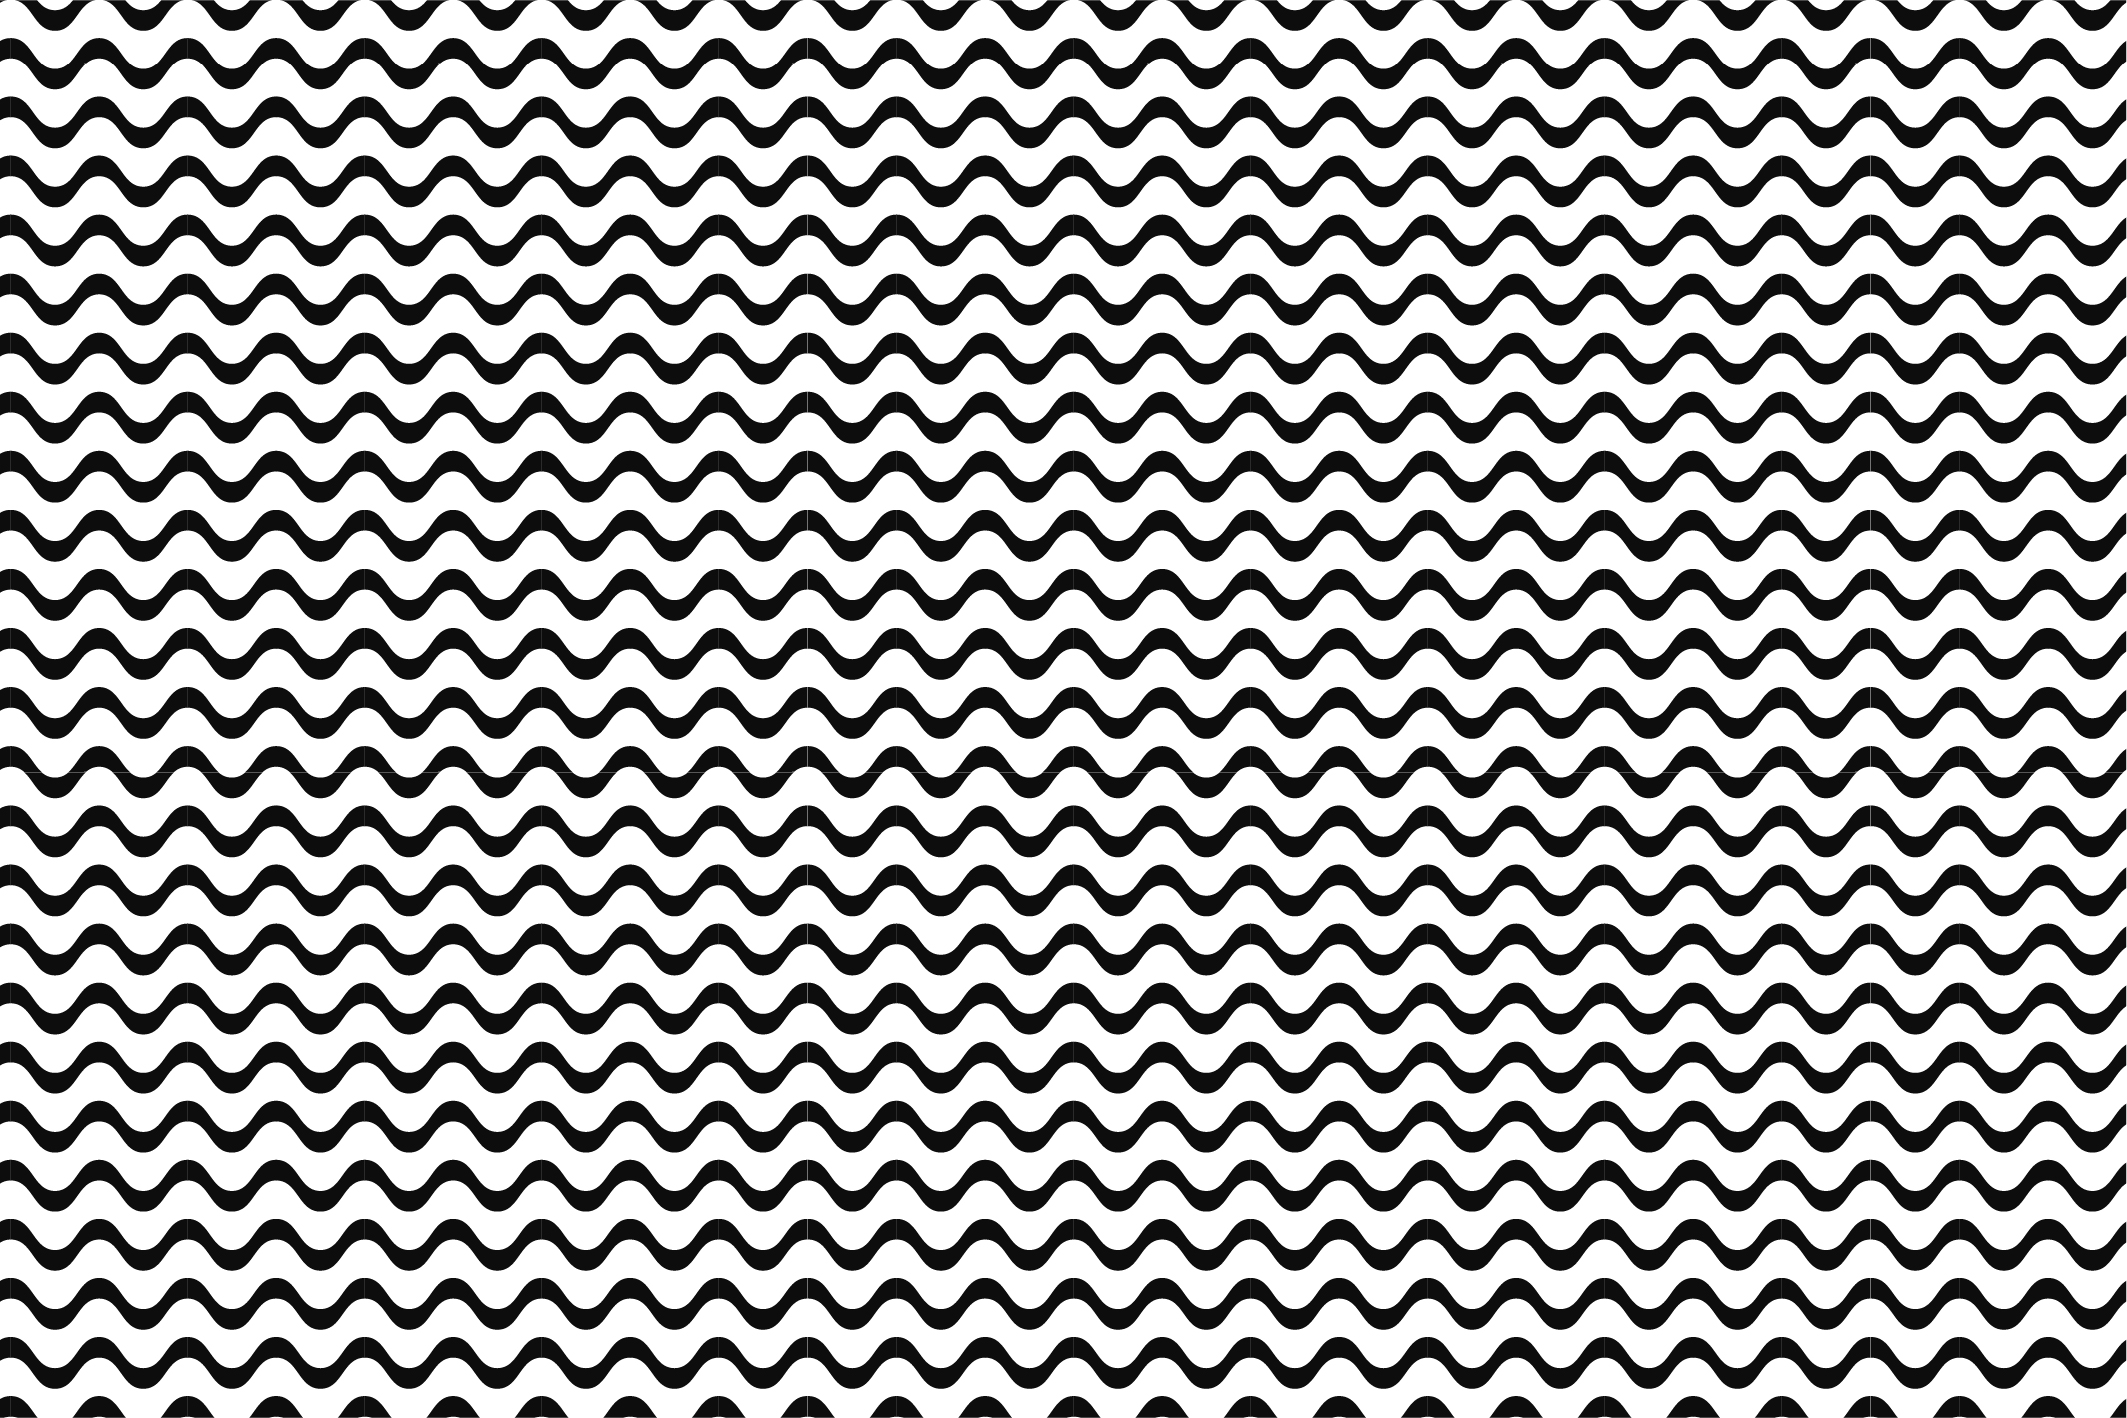 Wave&Zigzag seamless patterns. B&W. example image 6